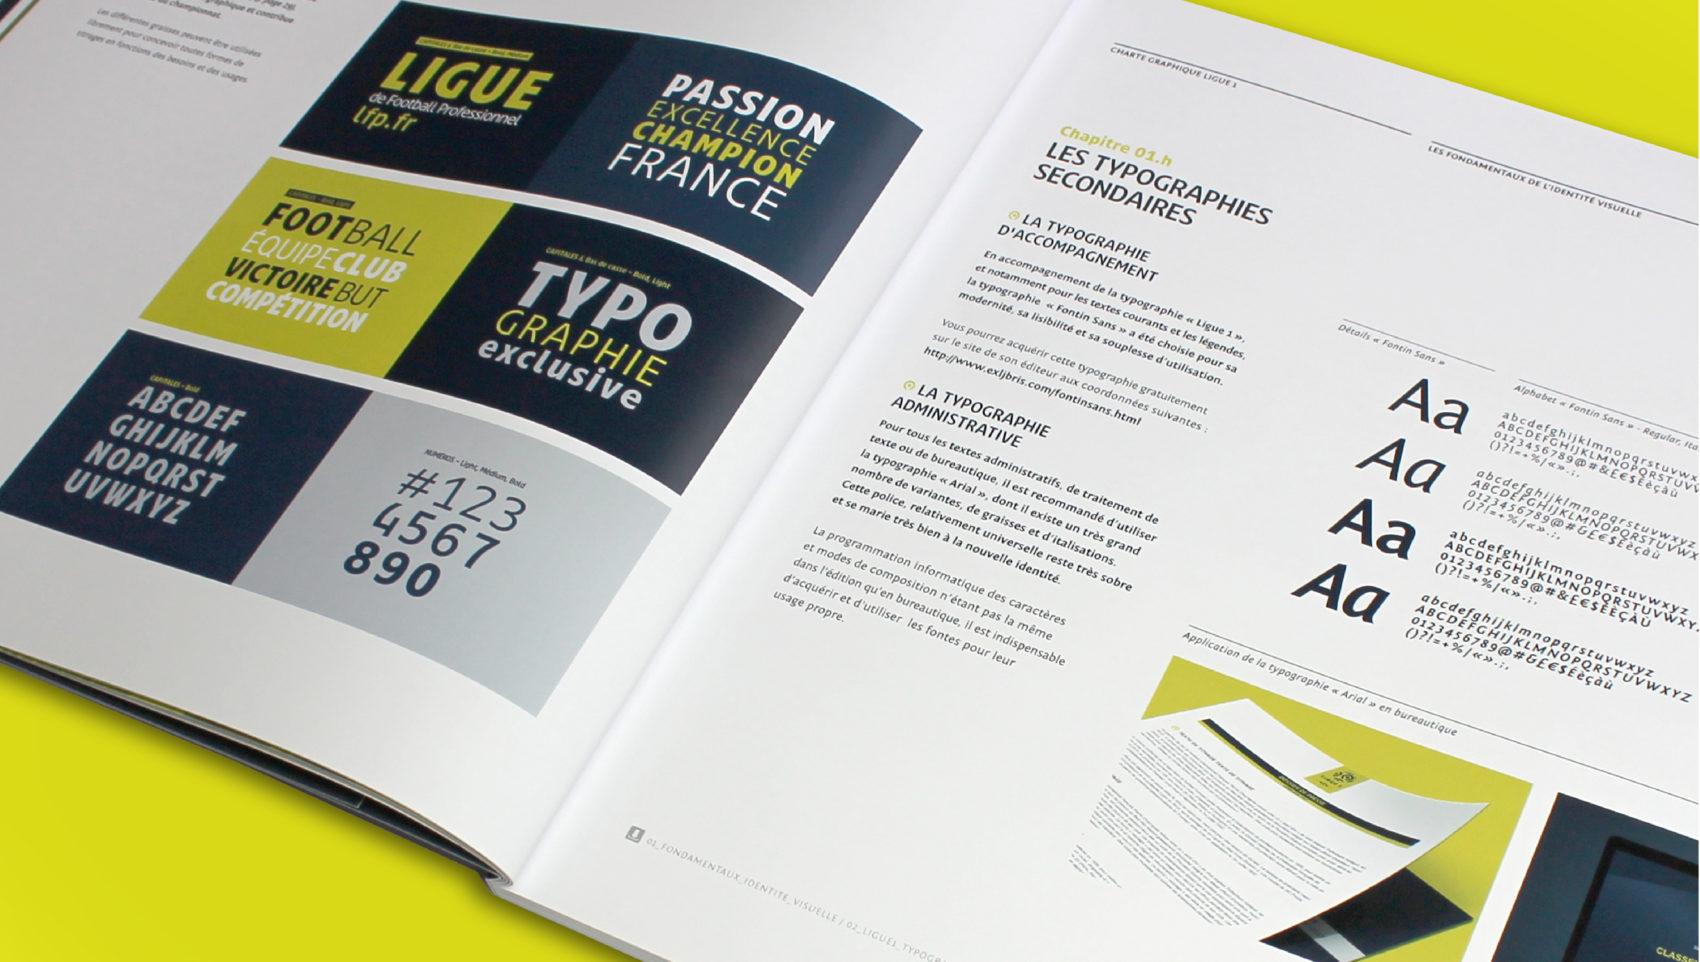 Projet_project_realisation_LFP_ligue_1_conforama_ligue_football_professionel_professional_league